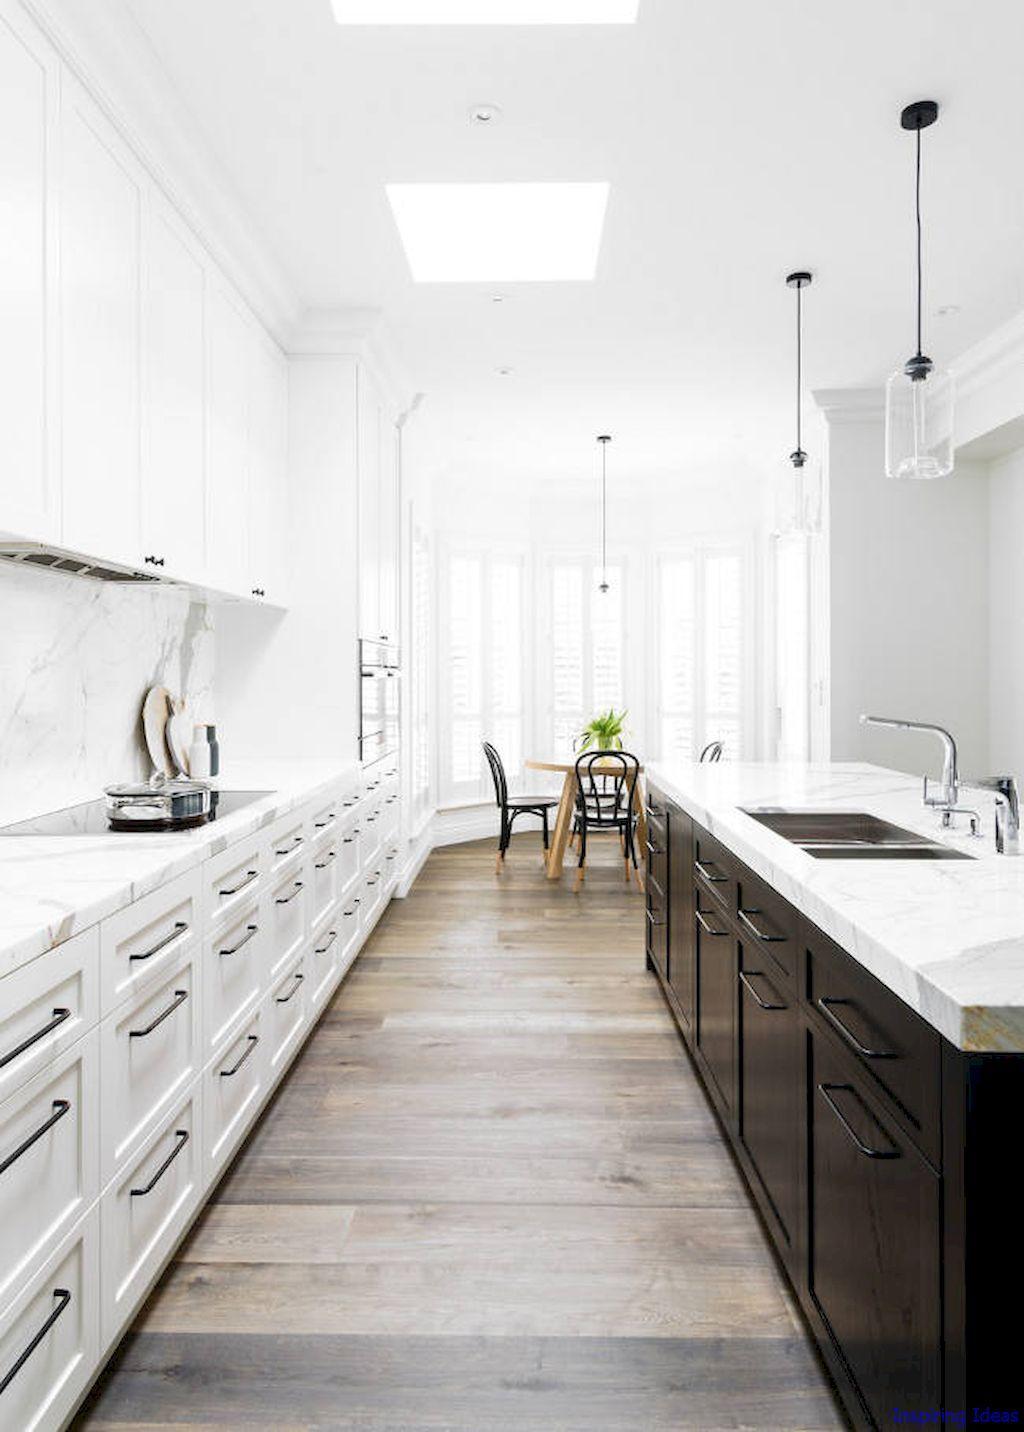 60 Luxury Black And White Kitchen Design Ideas  Kitchen Design Gorgeous Townhouse Kitchen Design Ideas 2018